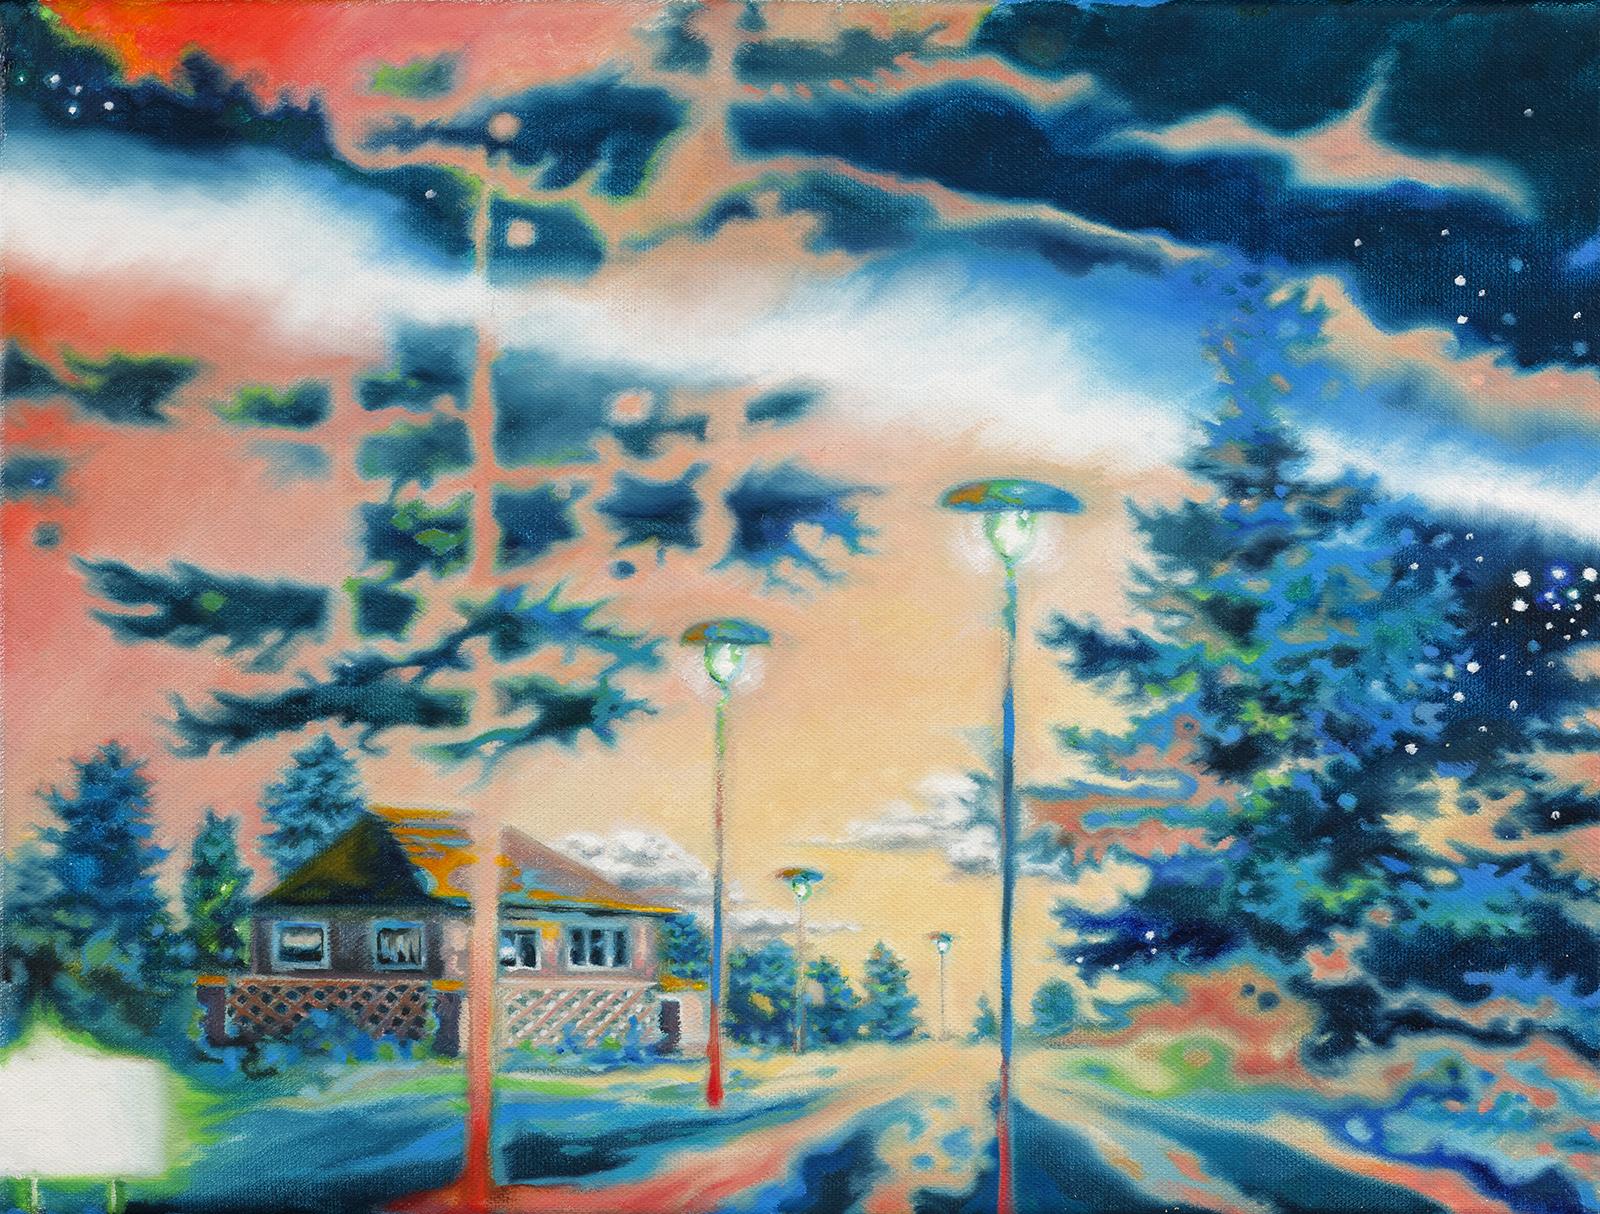 Refugium 2010, 30 x 40 cm, Öl auf Leinwand  Hide Away 2010, 30 x 40 cm, oil on canvas